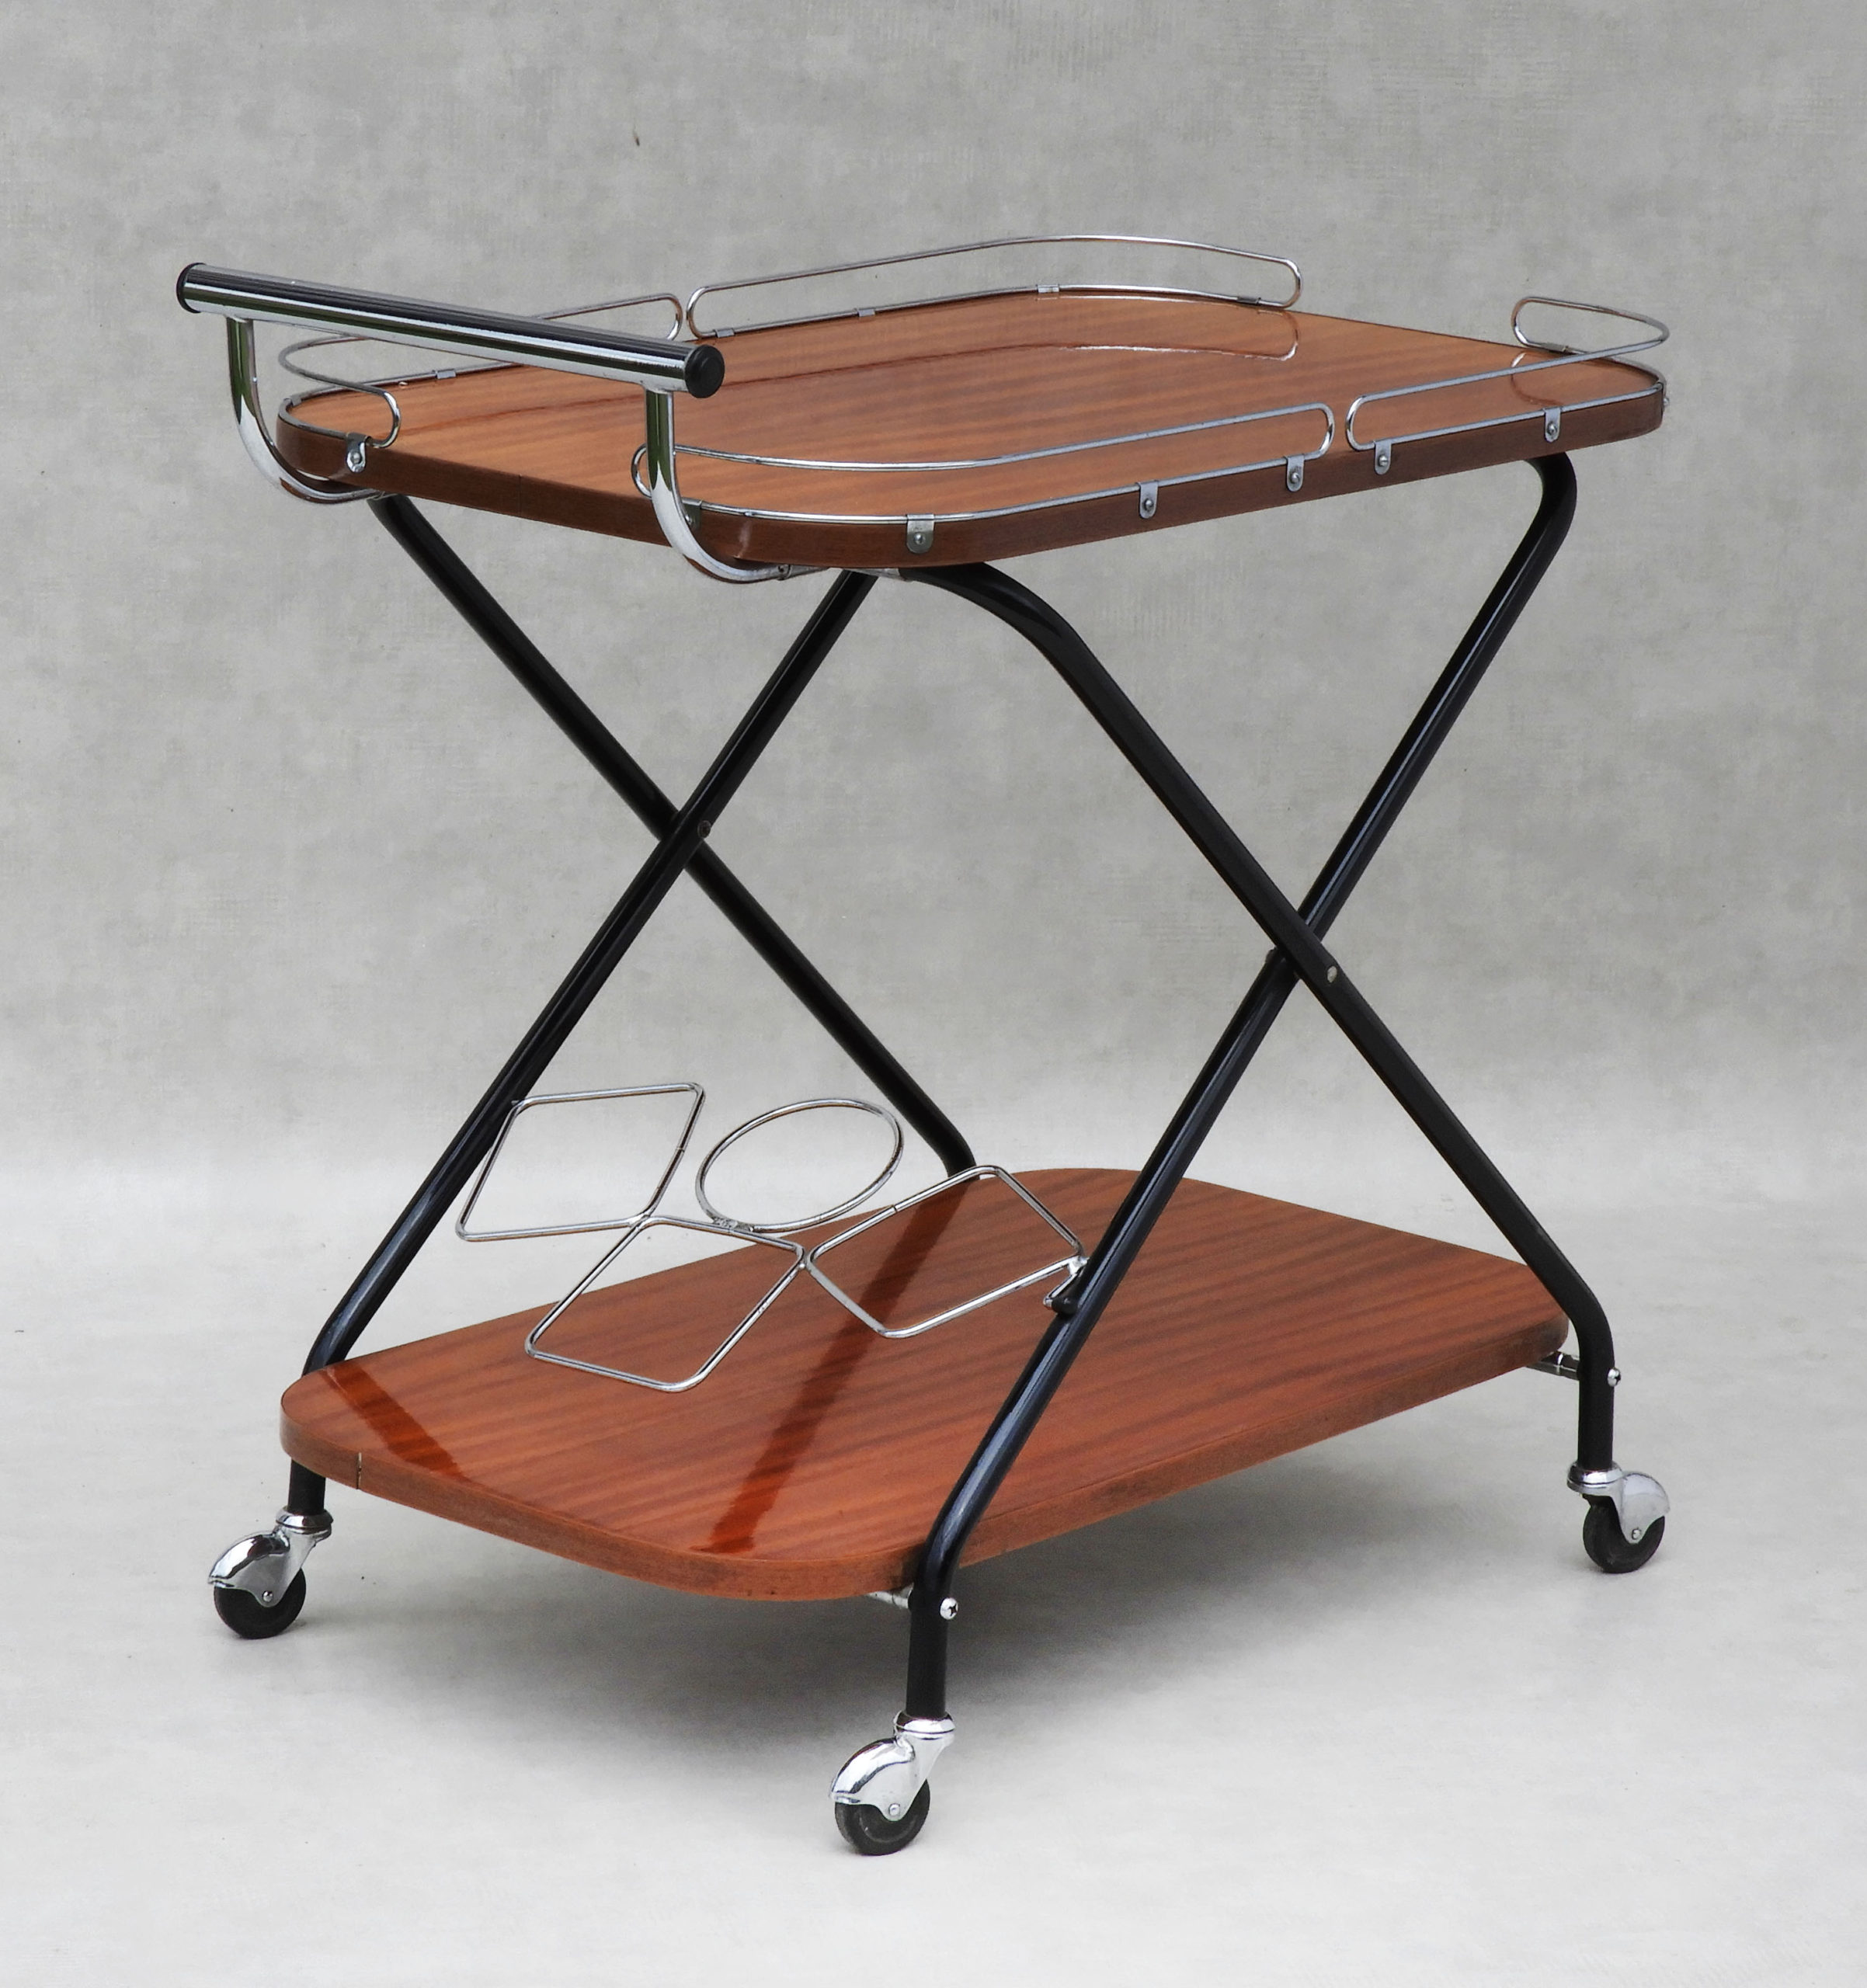 Vintage Mid Century Drinks Trolley Bar Cart 1960s France Atelier33bis